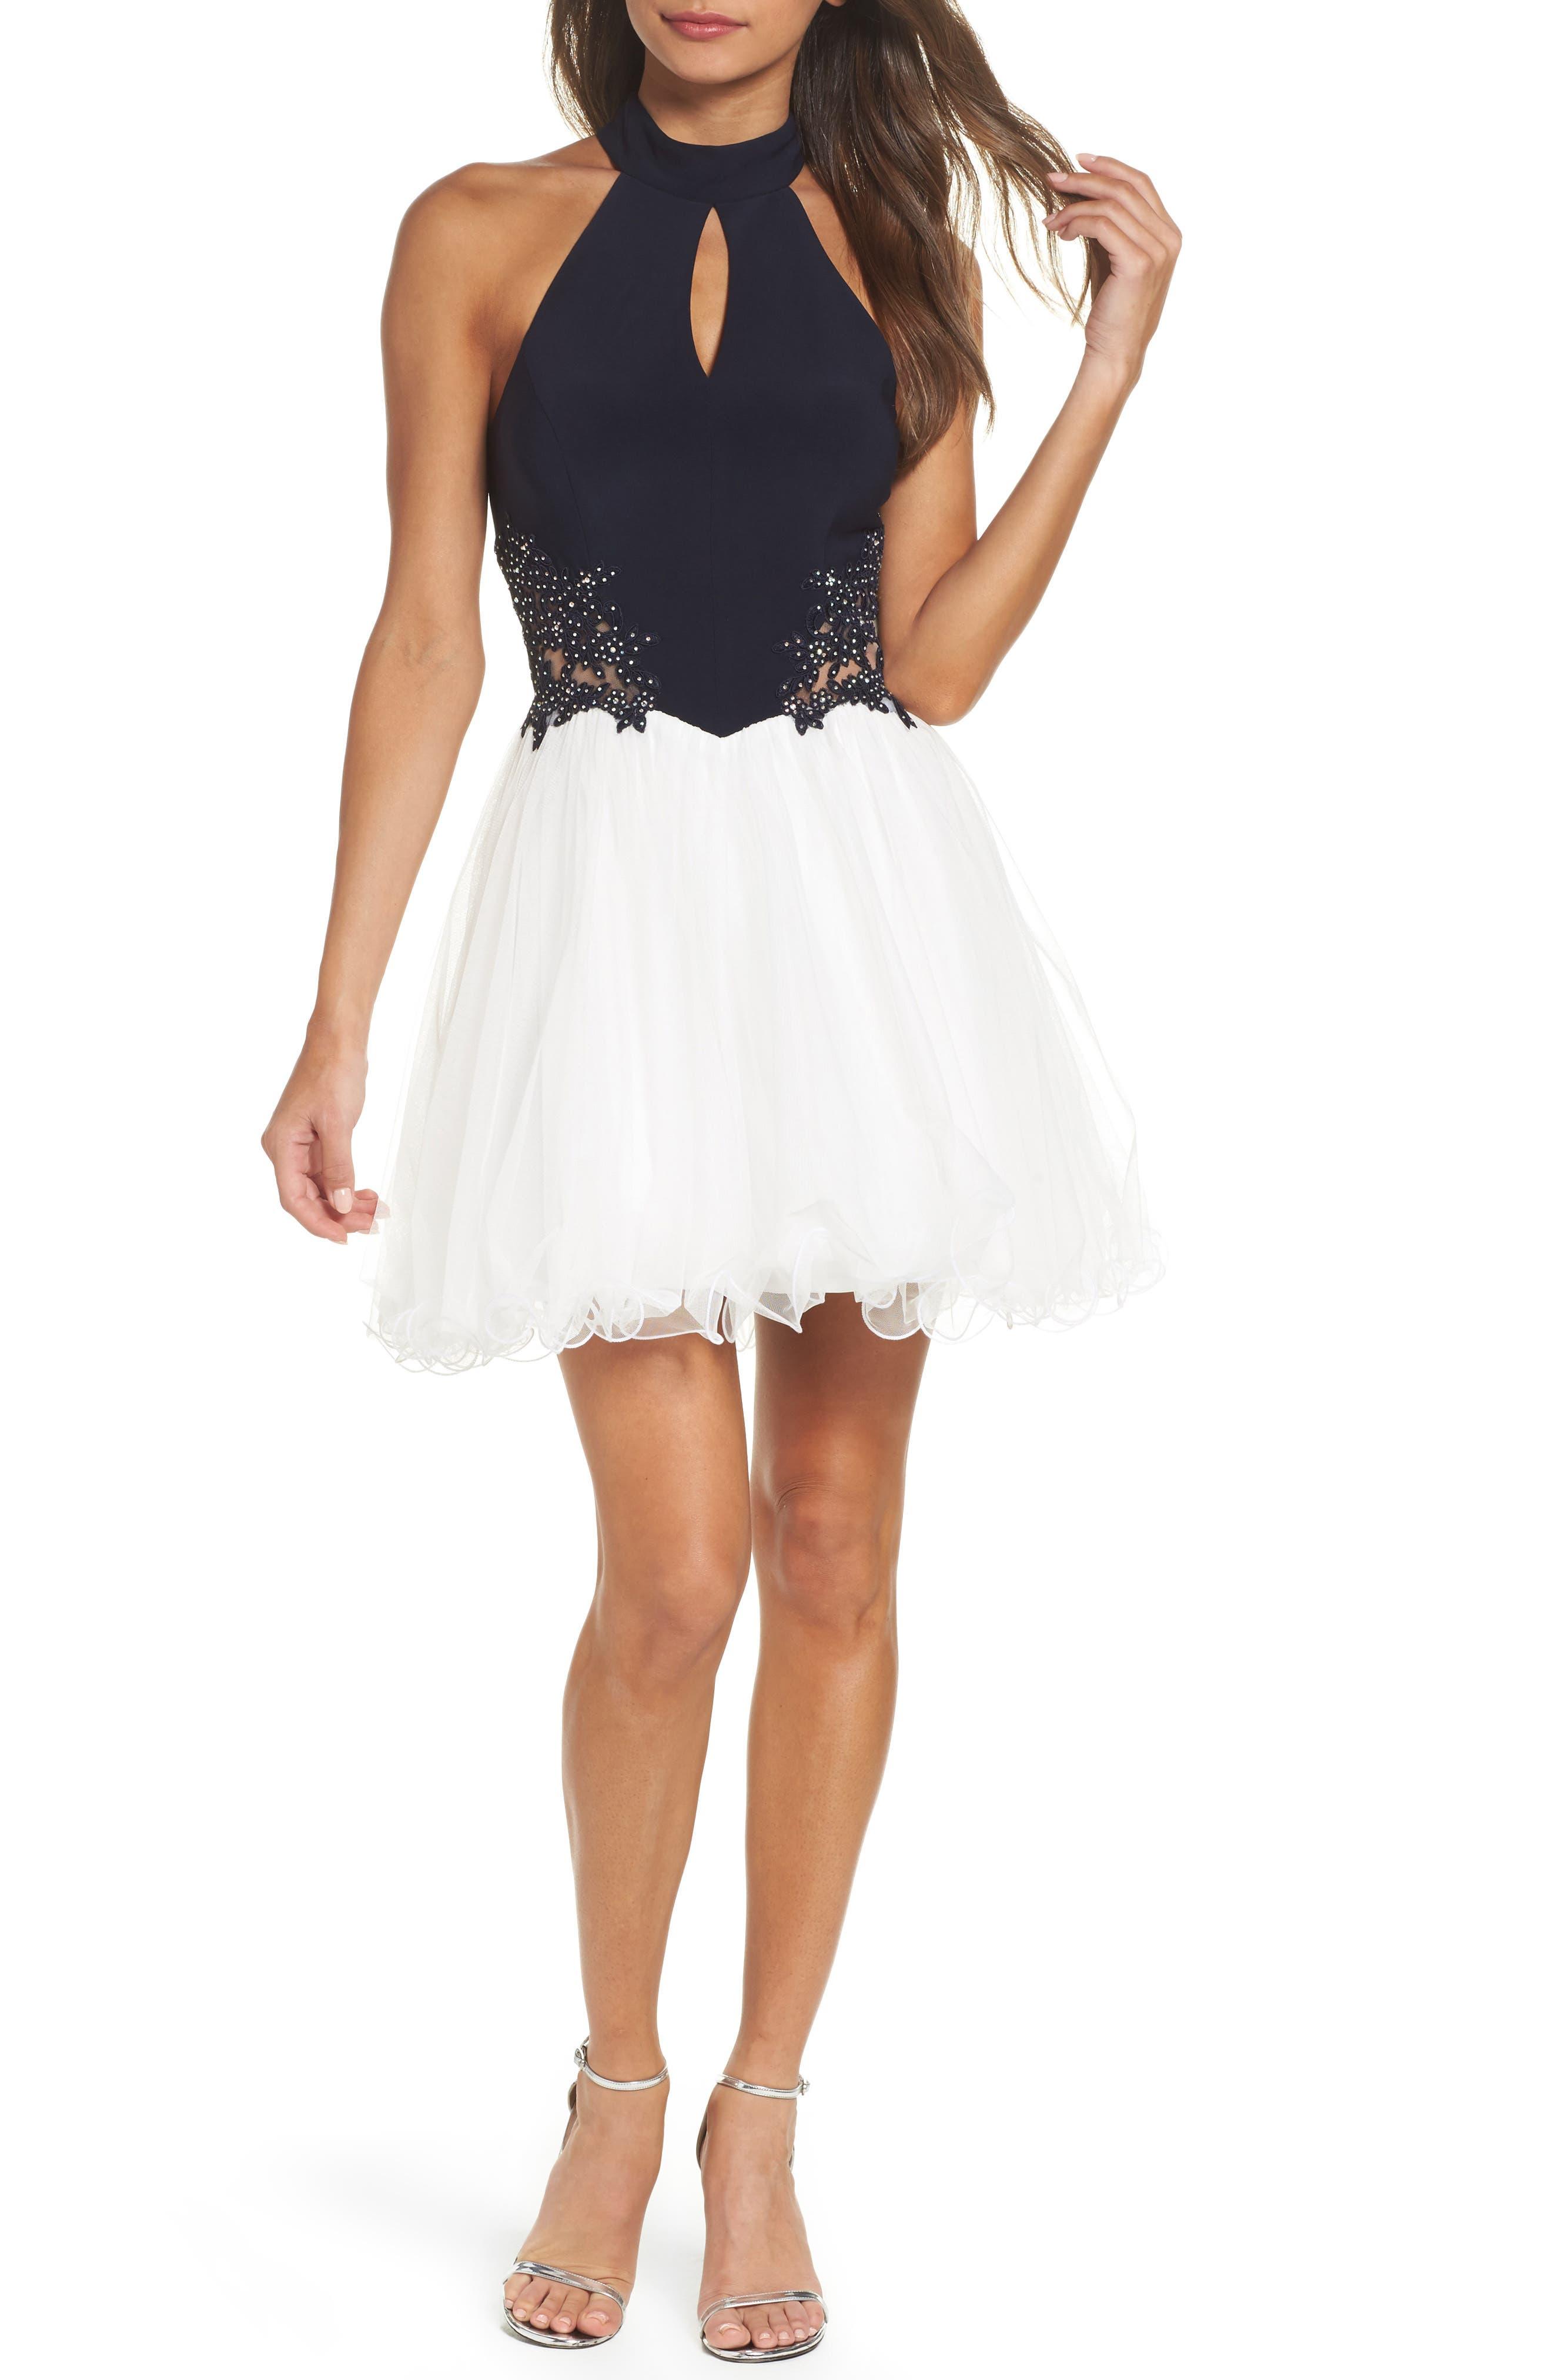 Alternate Image 1 Selected - Blondie Nites Keyhole Appliqué Fit & Flare Dress